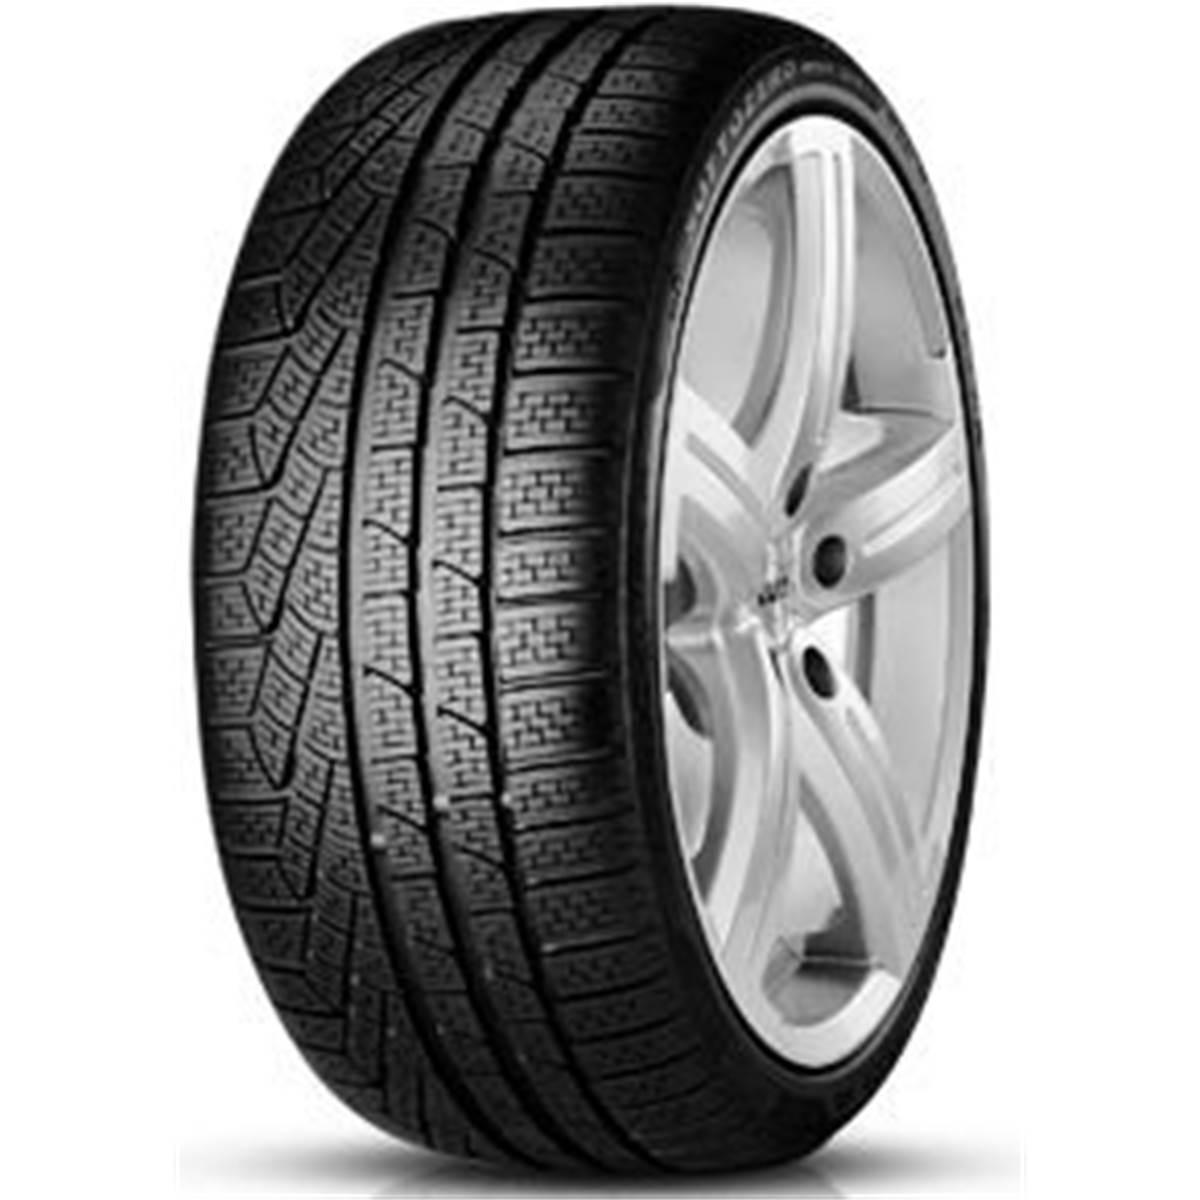 Pirelli Winter 270 Sottozero Ii Xl